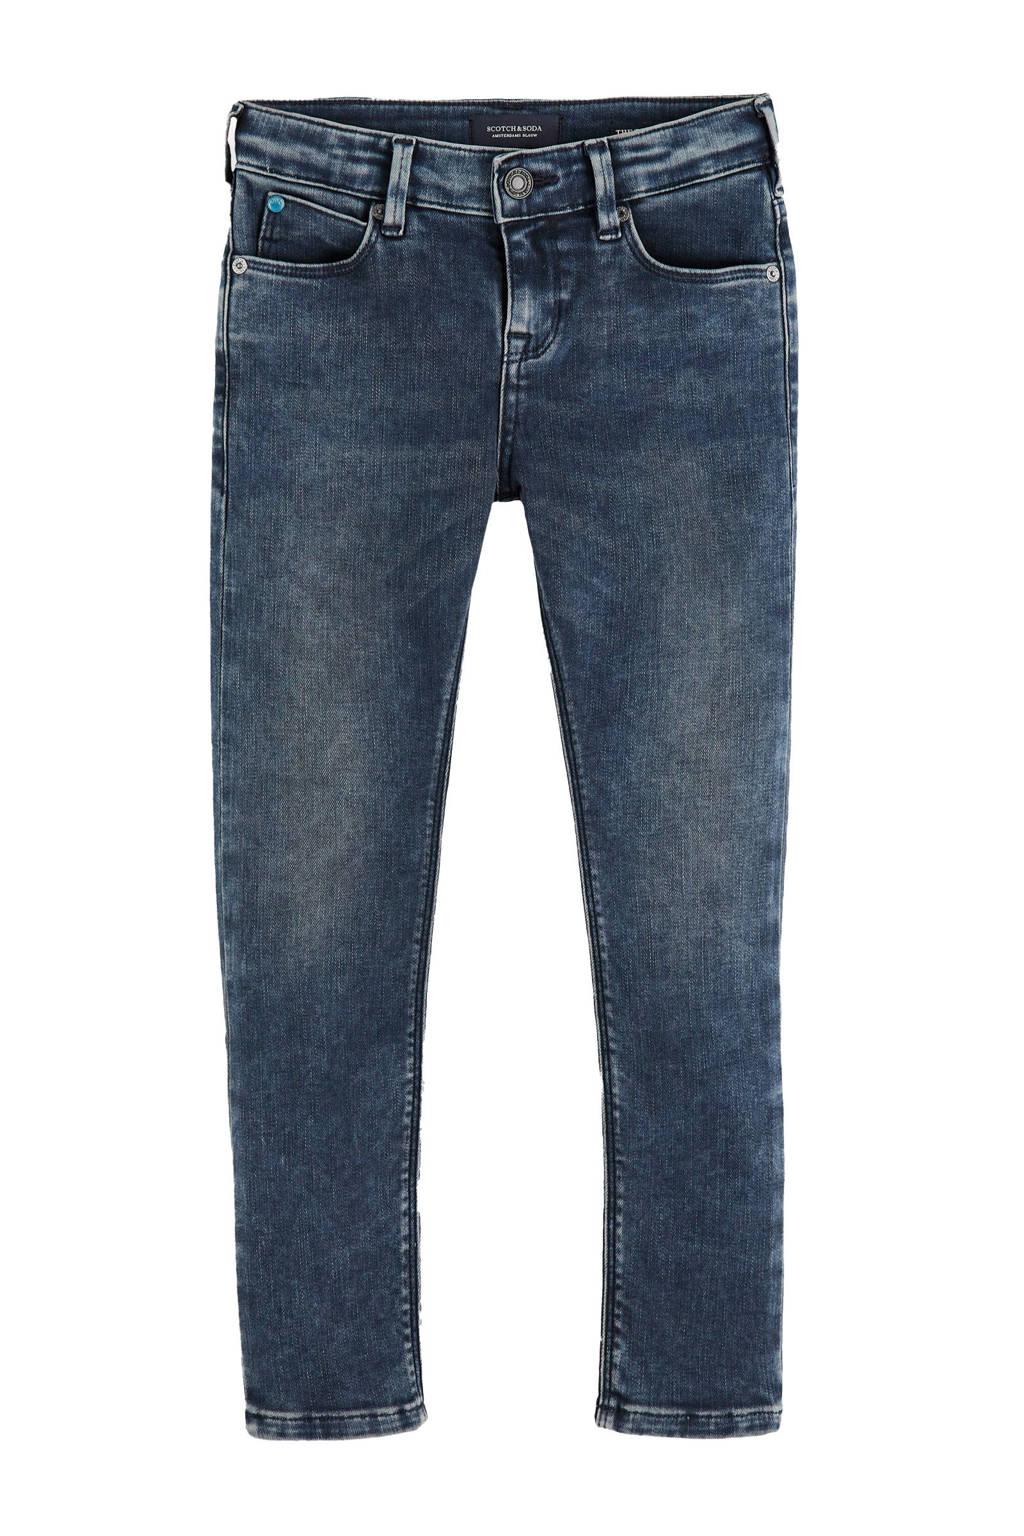 Scotch & Soda slim fit jeans dark denim, Dark denim